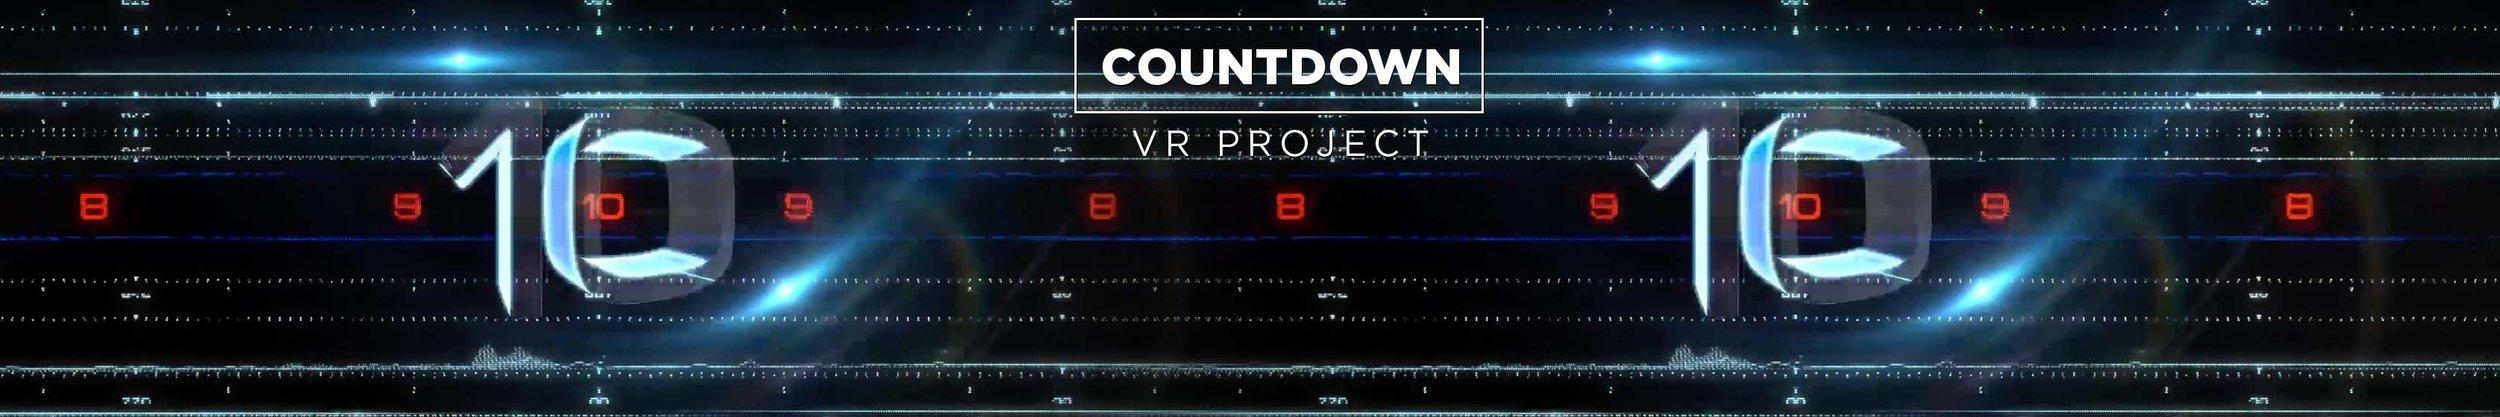 Countdown_ThumbCropped.jpg